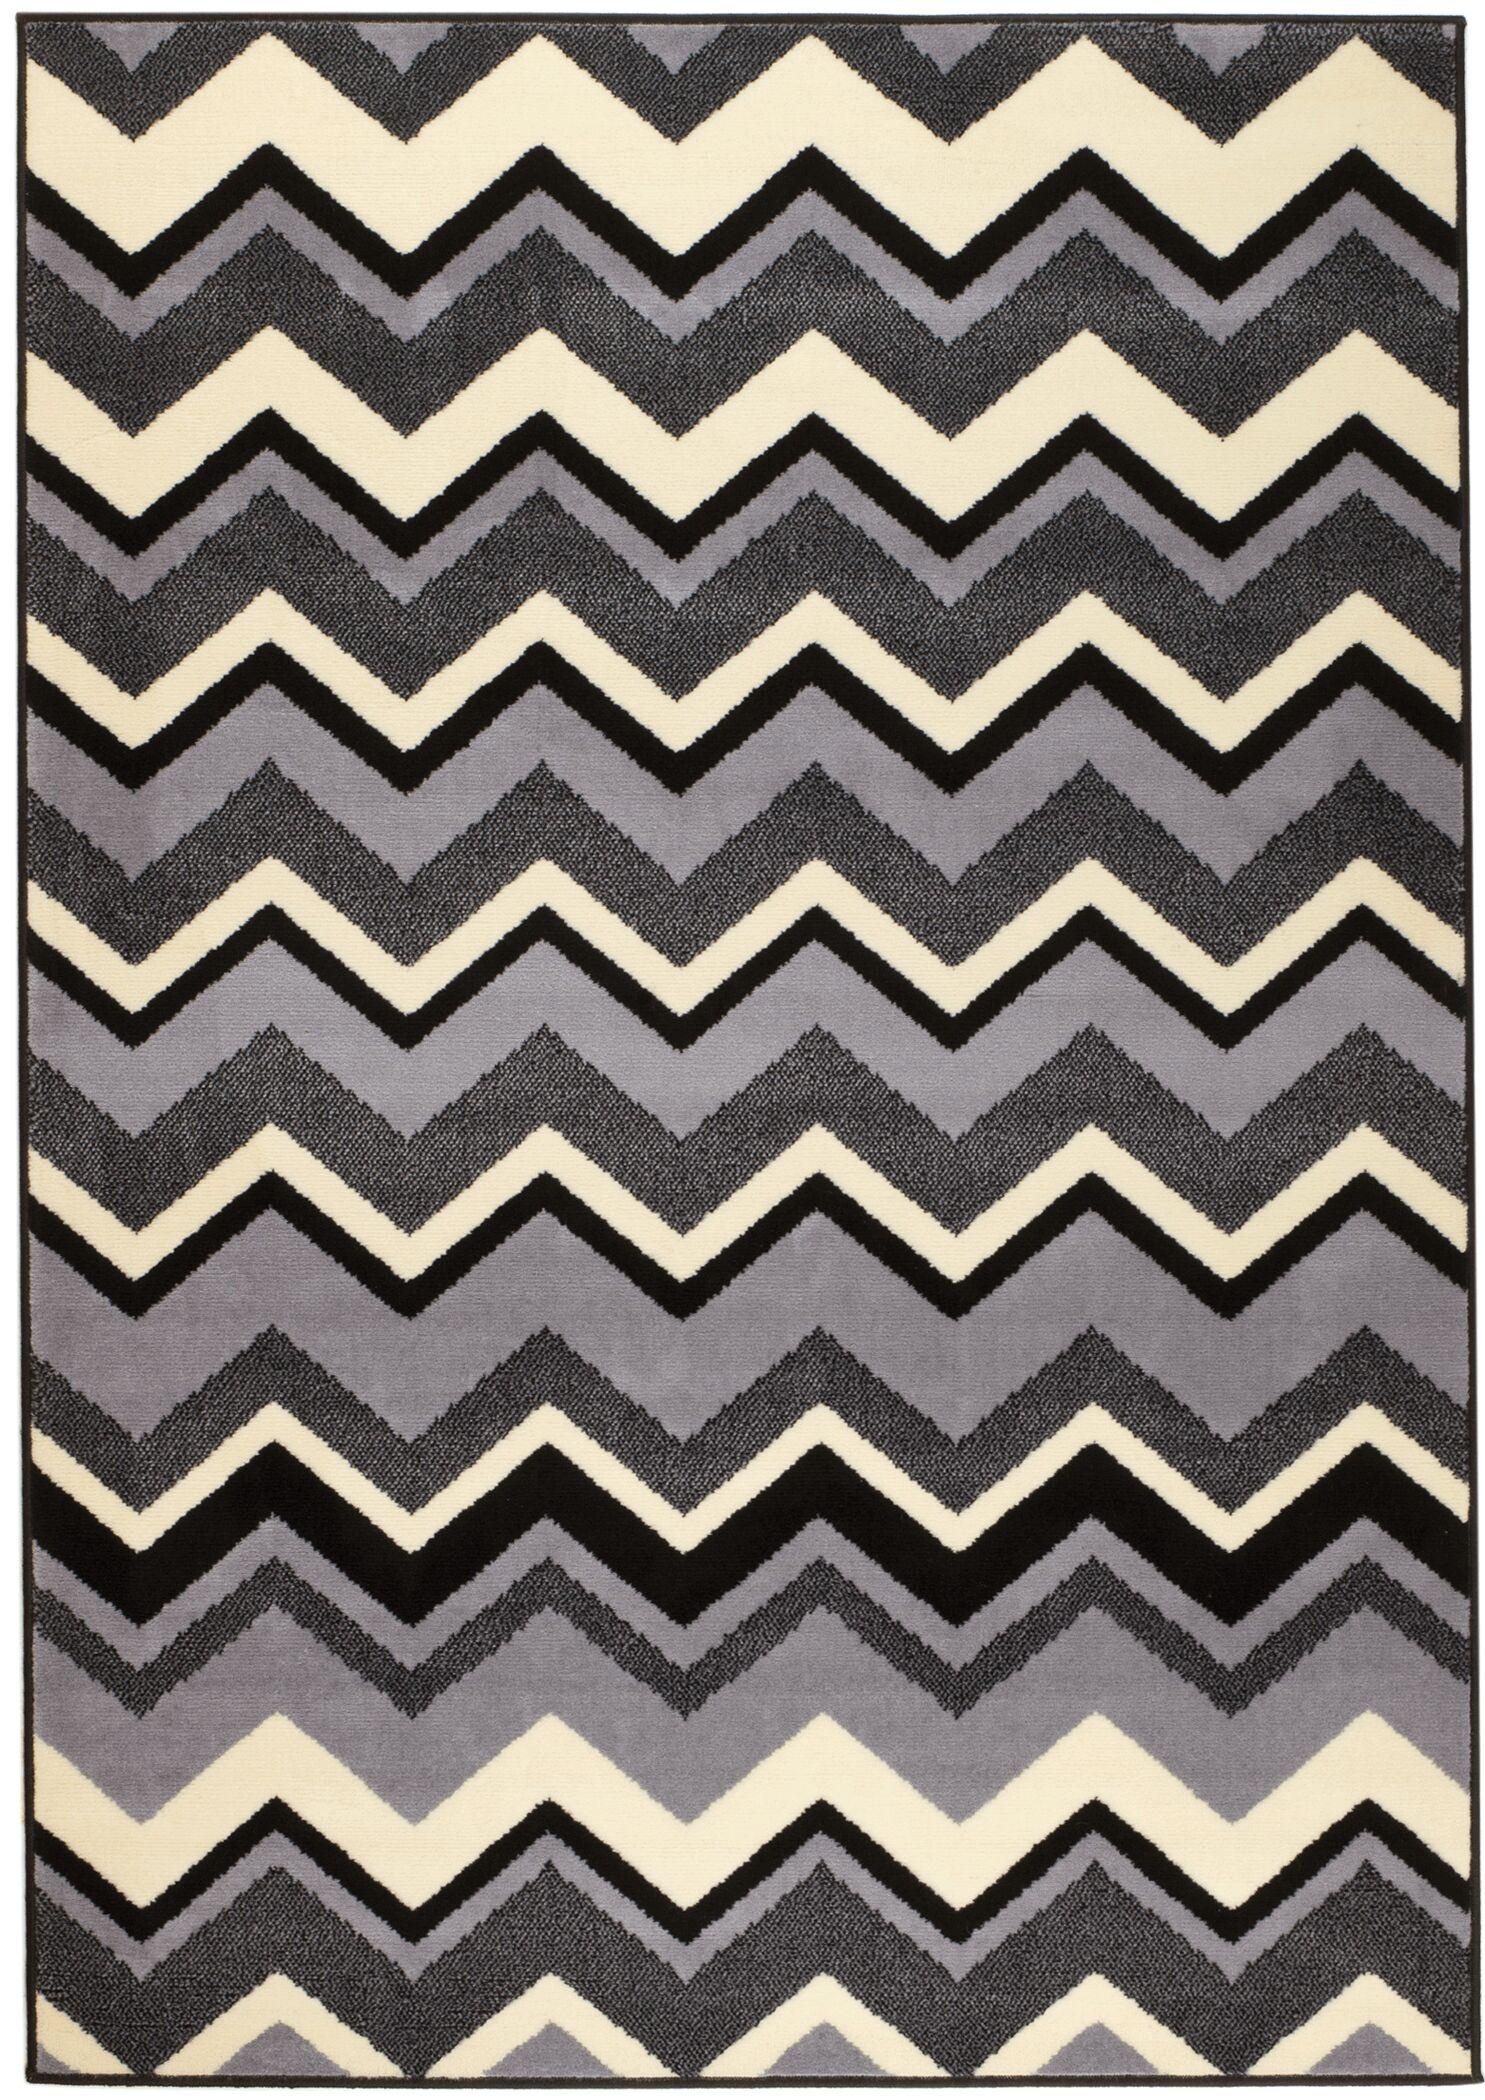 Steptoe Black/Gray Area Rug Rug Size: 1'10